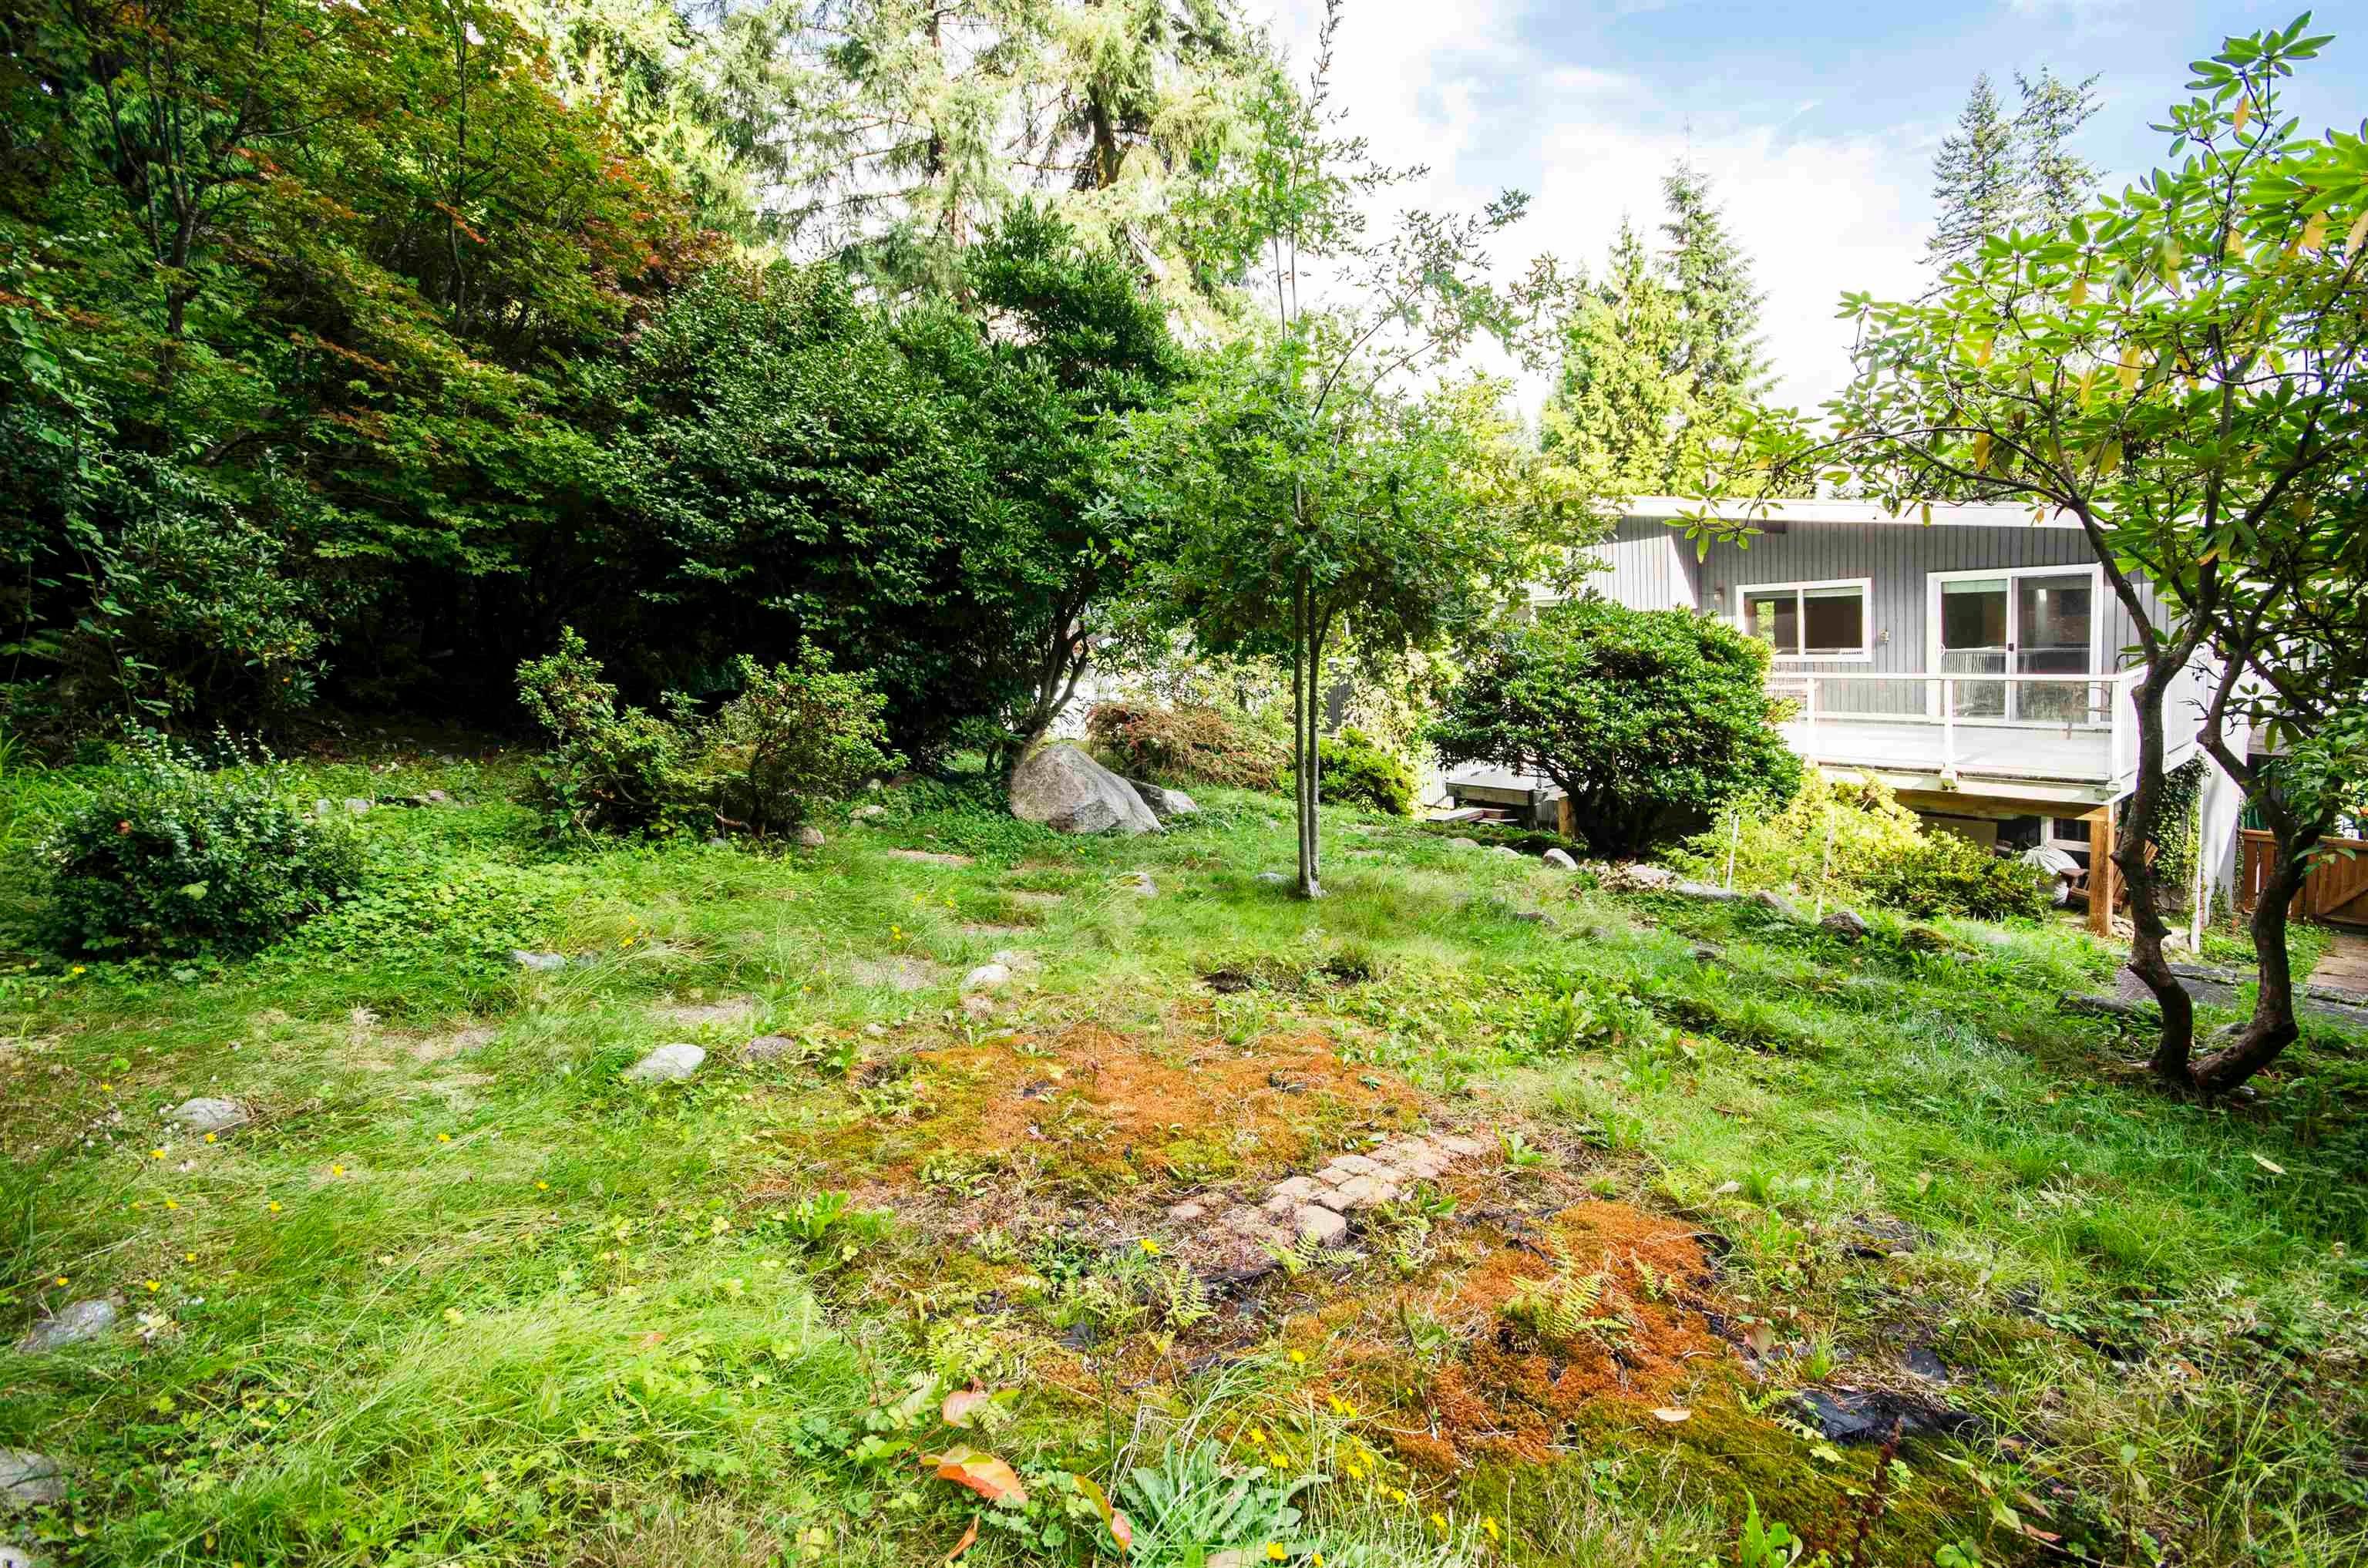 3785 REGENT AVENUE - Upper Lonsdale House/Single Family for sale, 4 Bedrooms (R2617648) - #24